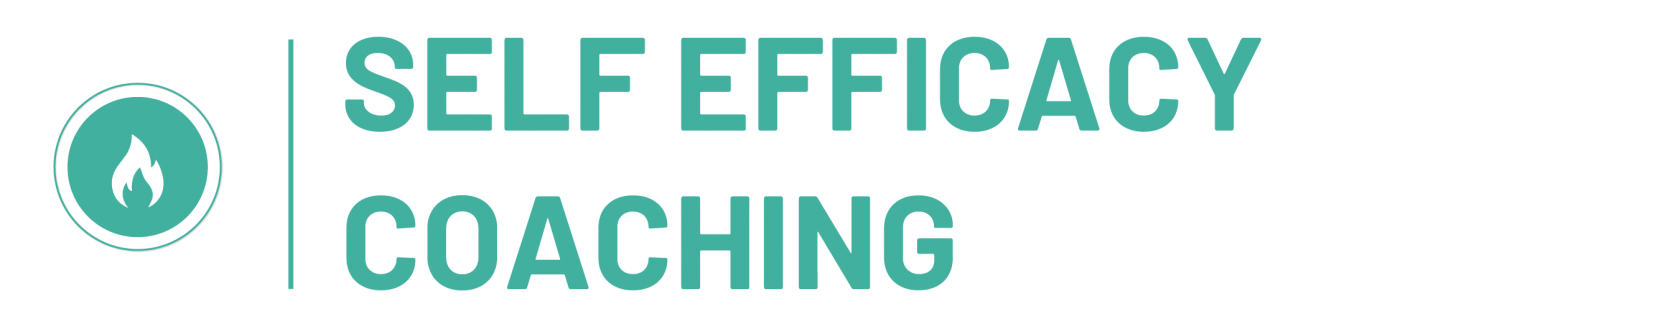 Header SELFEFFICACYCOACHINGacerchio-01